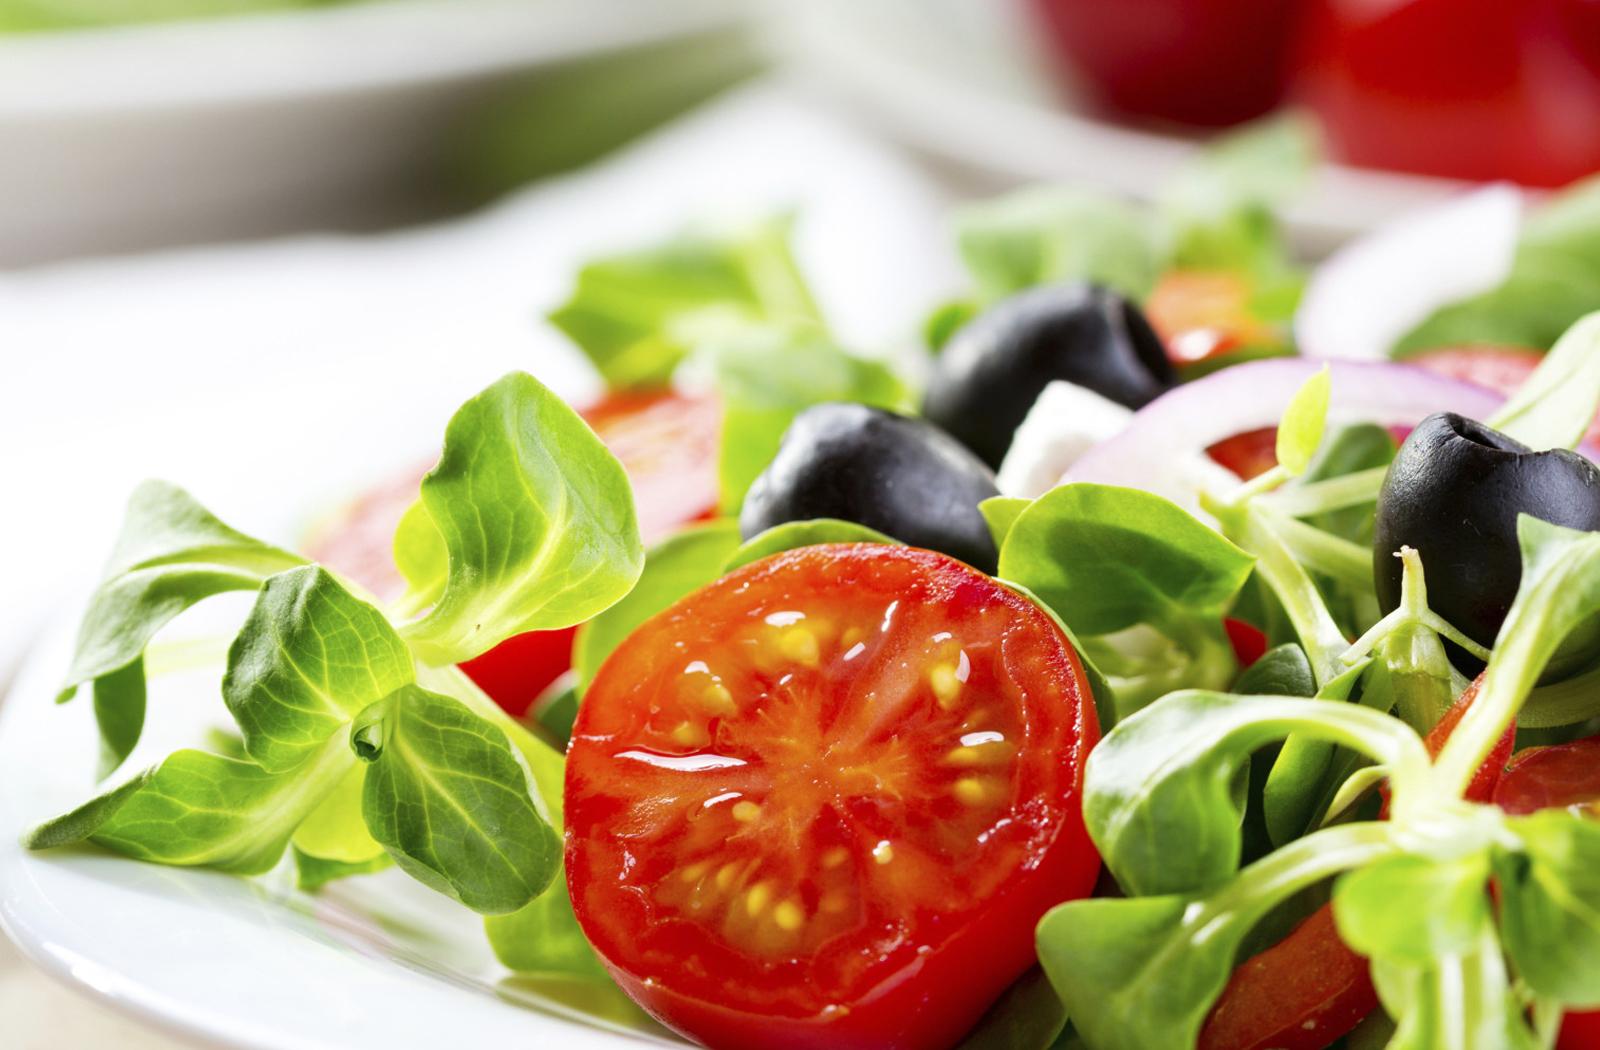 karel van der vorm - salades